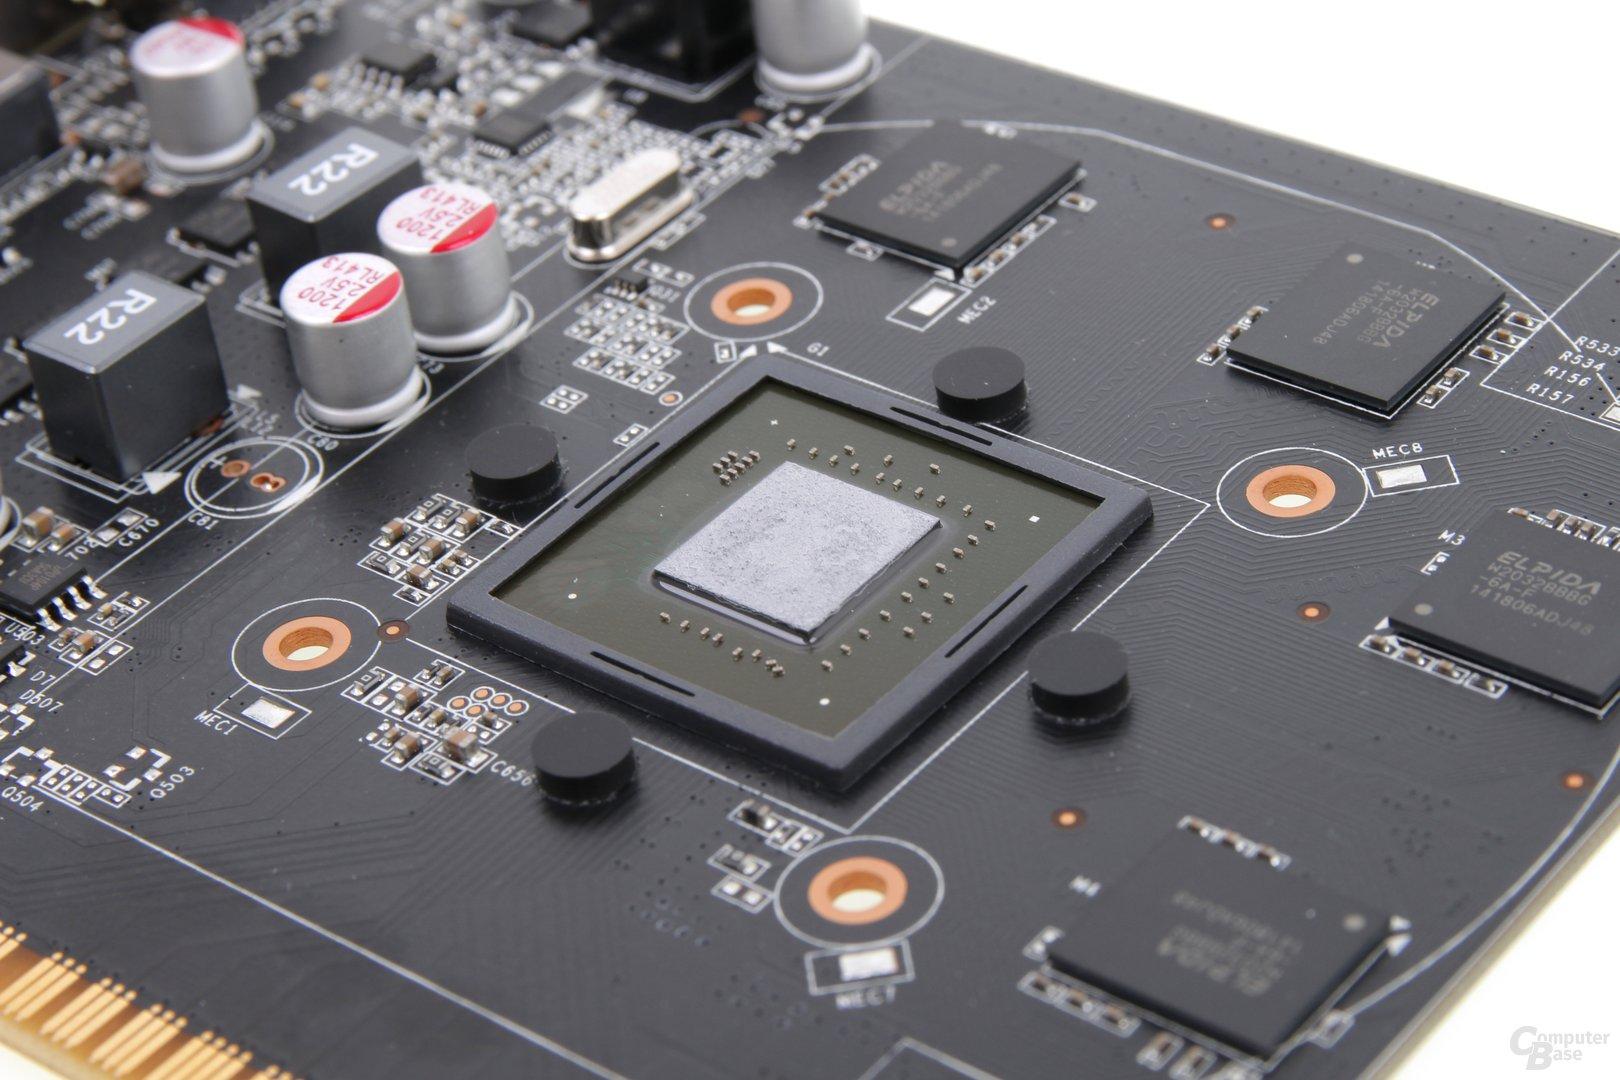 Zotac GeForce GTX 750 Zone - GM107-GPU